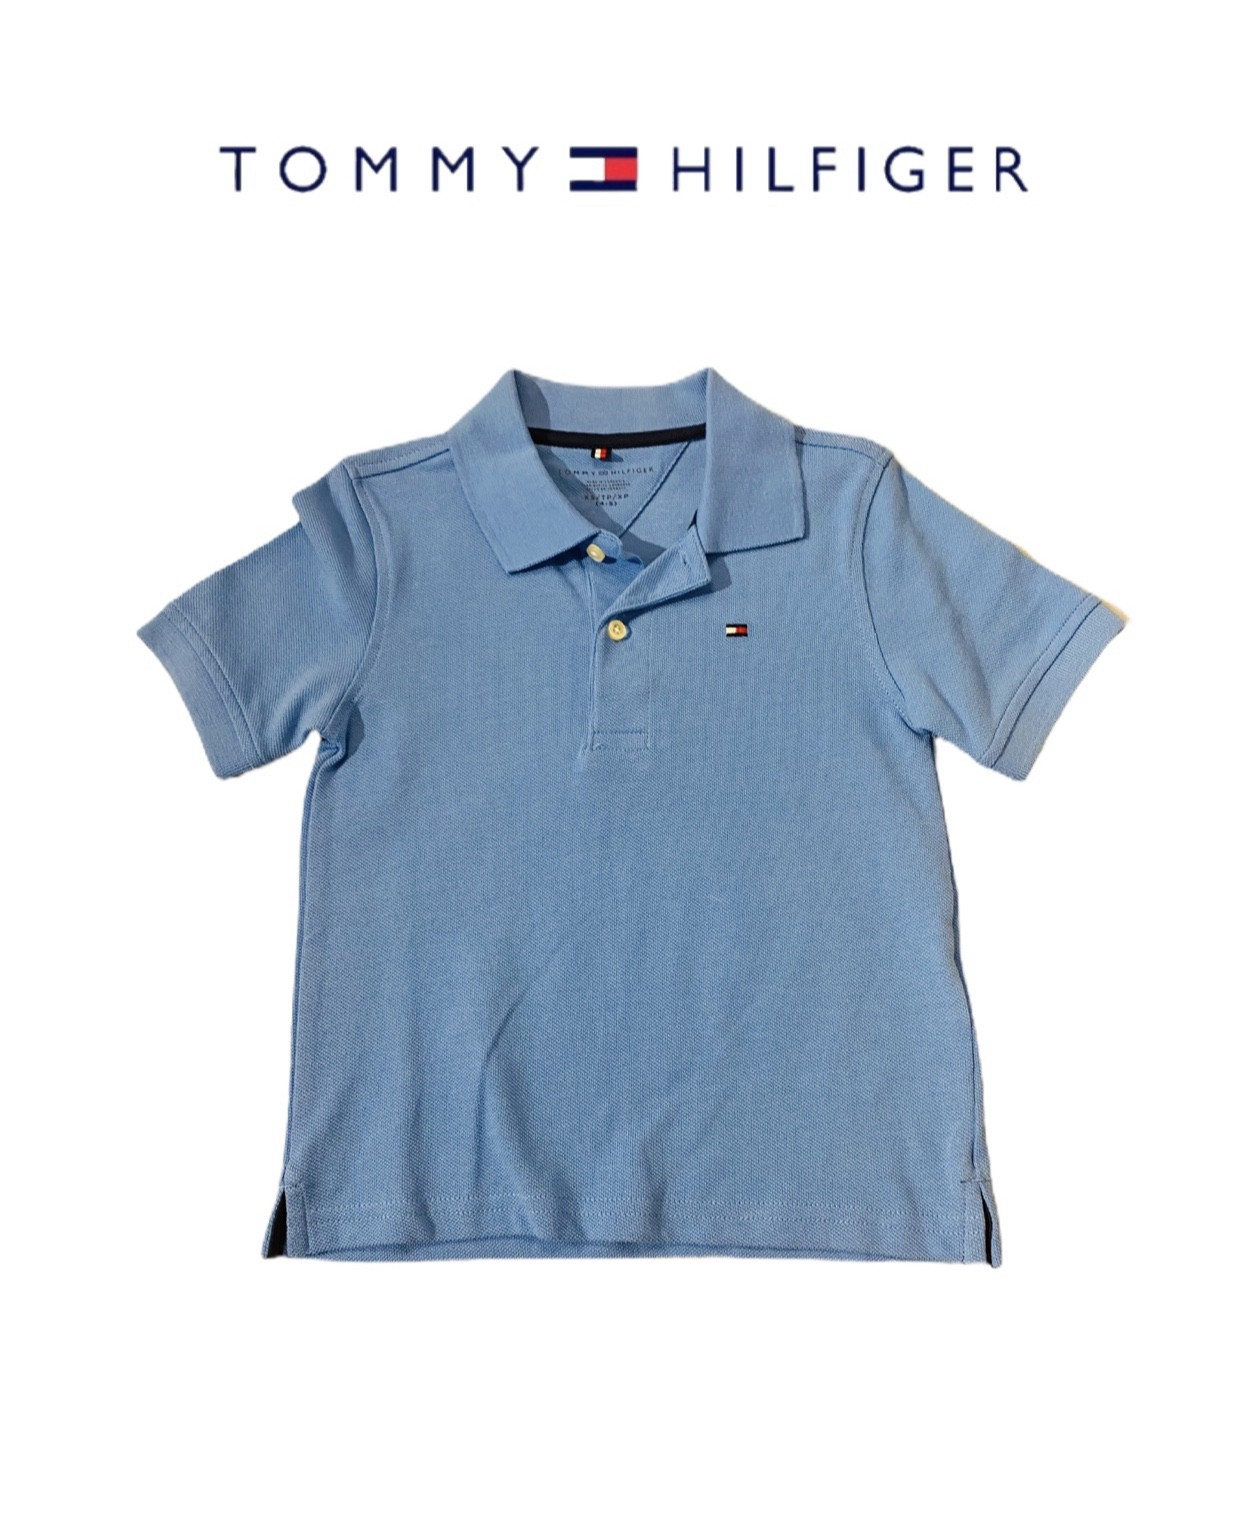 POLO TOMMY HILFIGER® AZUL